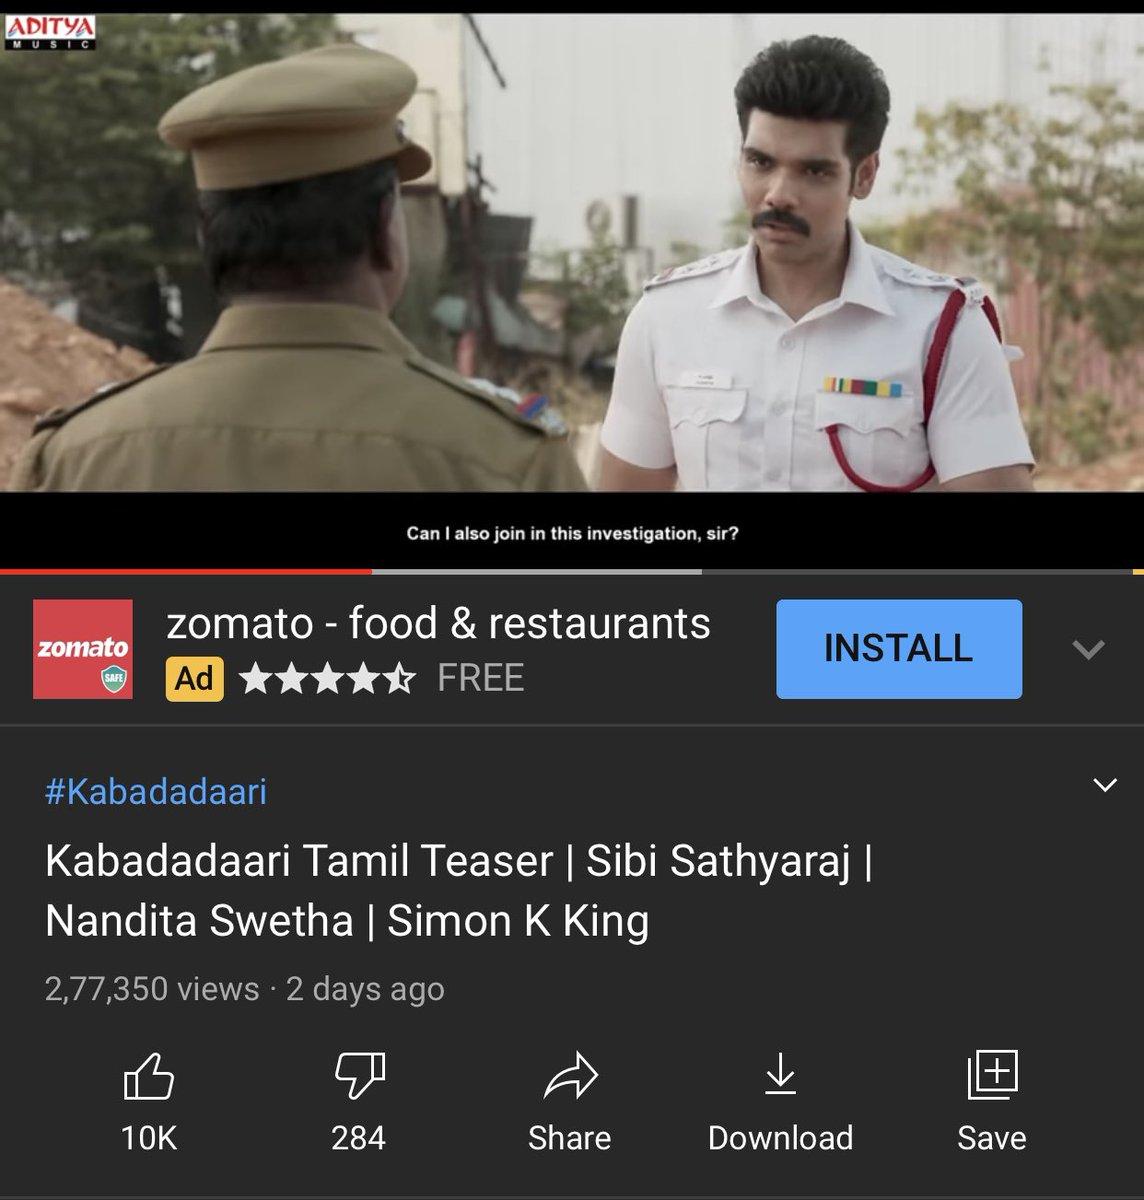 #KabadadaariTeaser crossed 5 Lakhs Digital Views 🔥🔥 (YouTube & Facebook )     @Sibi_Sathyaraj @Directorpradeep @simonkking @dhananjayang @lalithagd @adityamusic